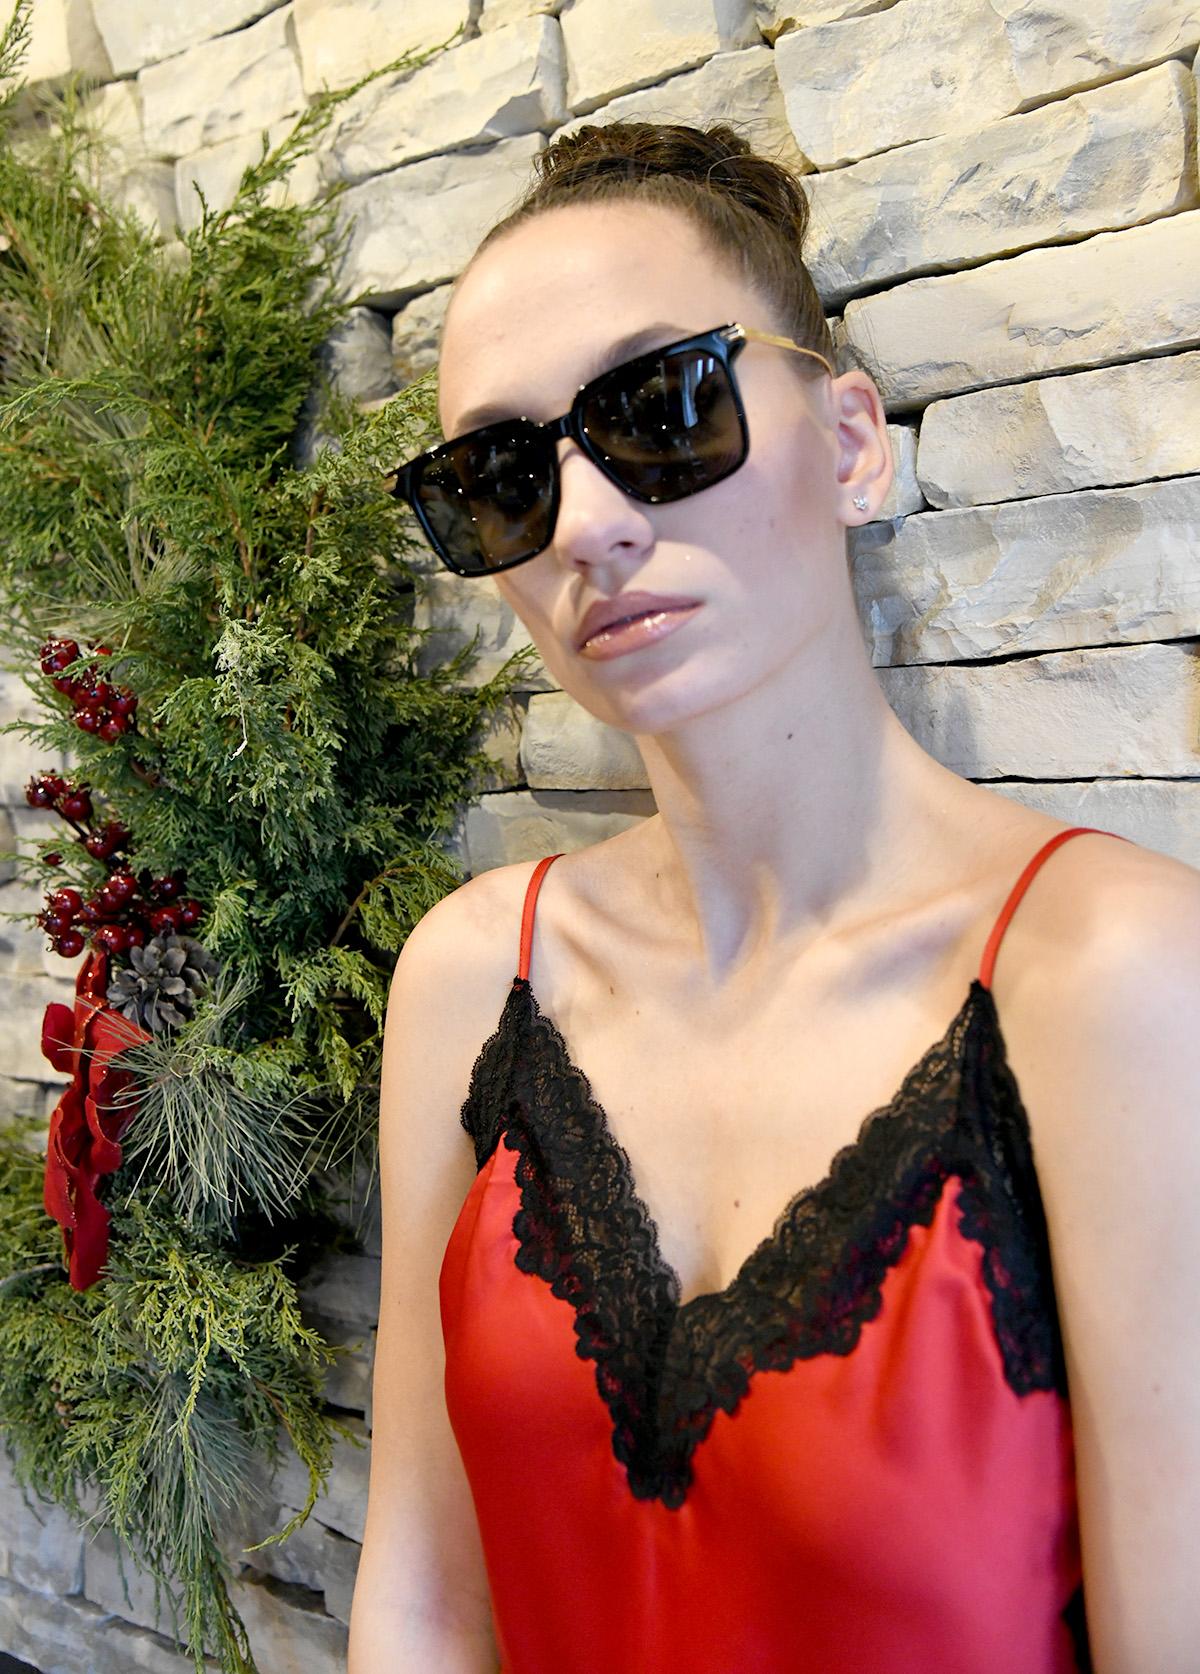 Gucci, Balenciaga, Bottega Veneta i Saint Laurent - evo koji modeli uskoro stižu u optike!